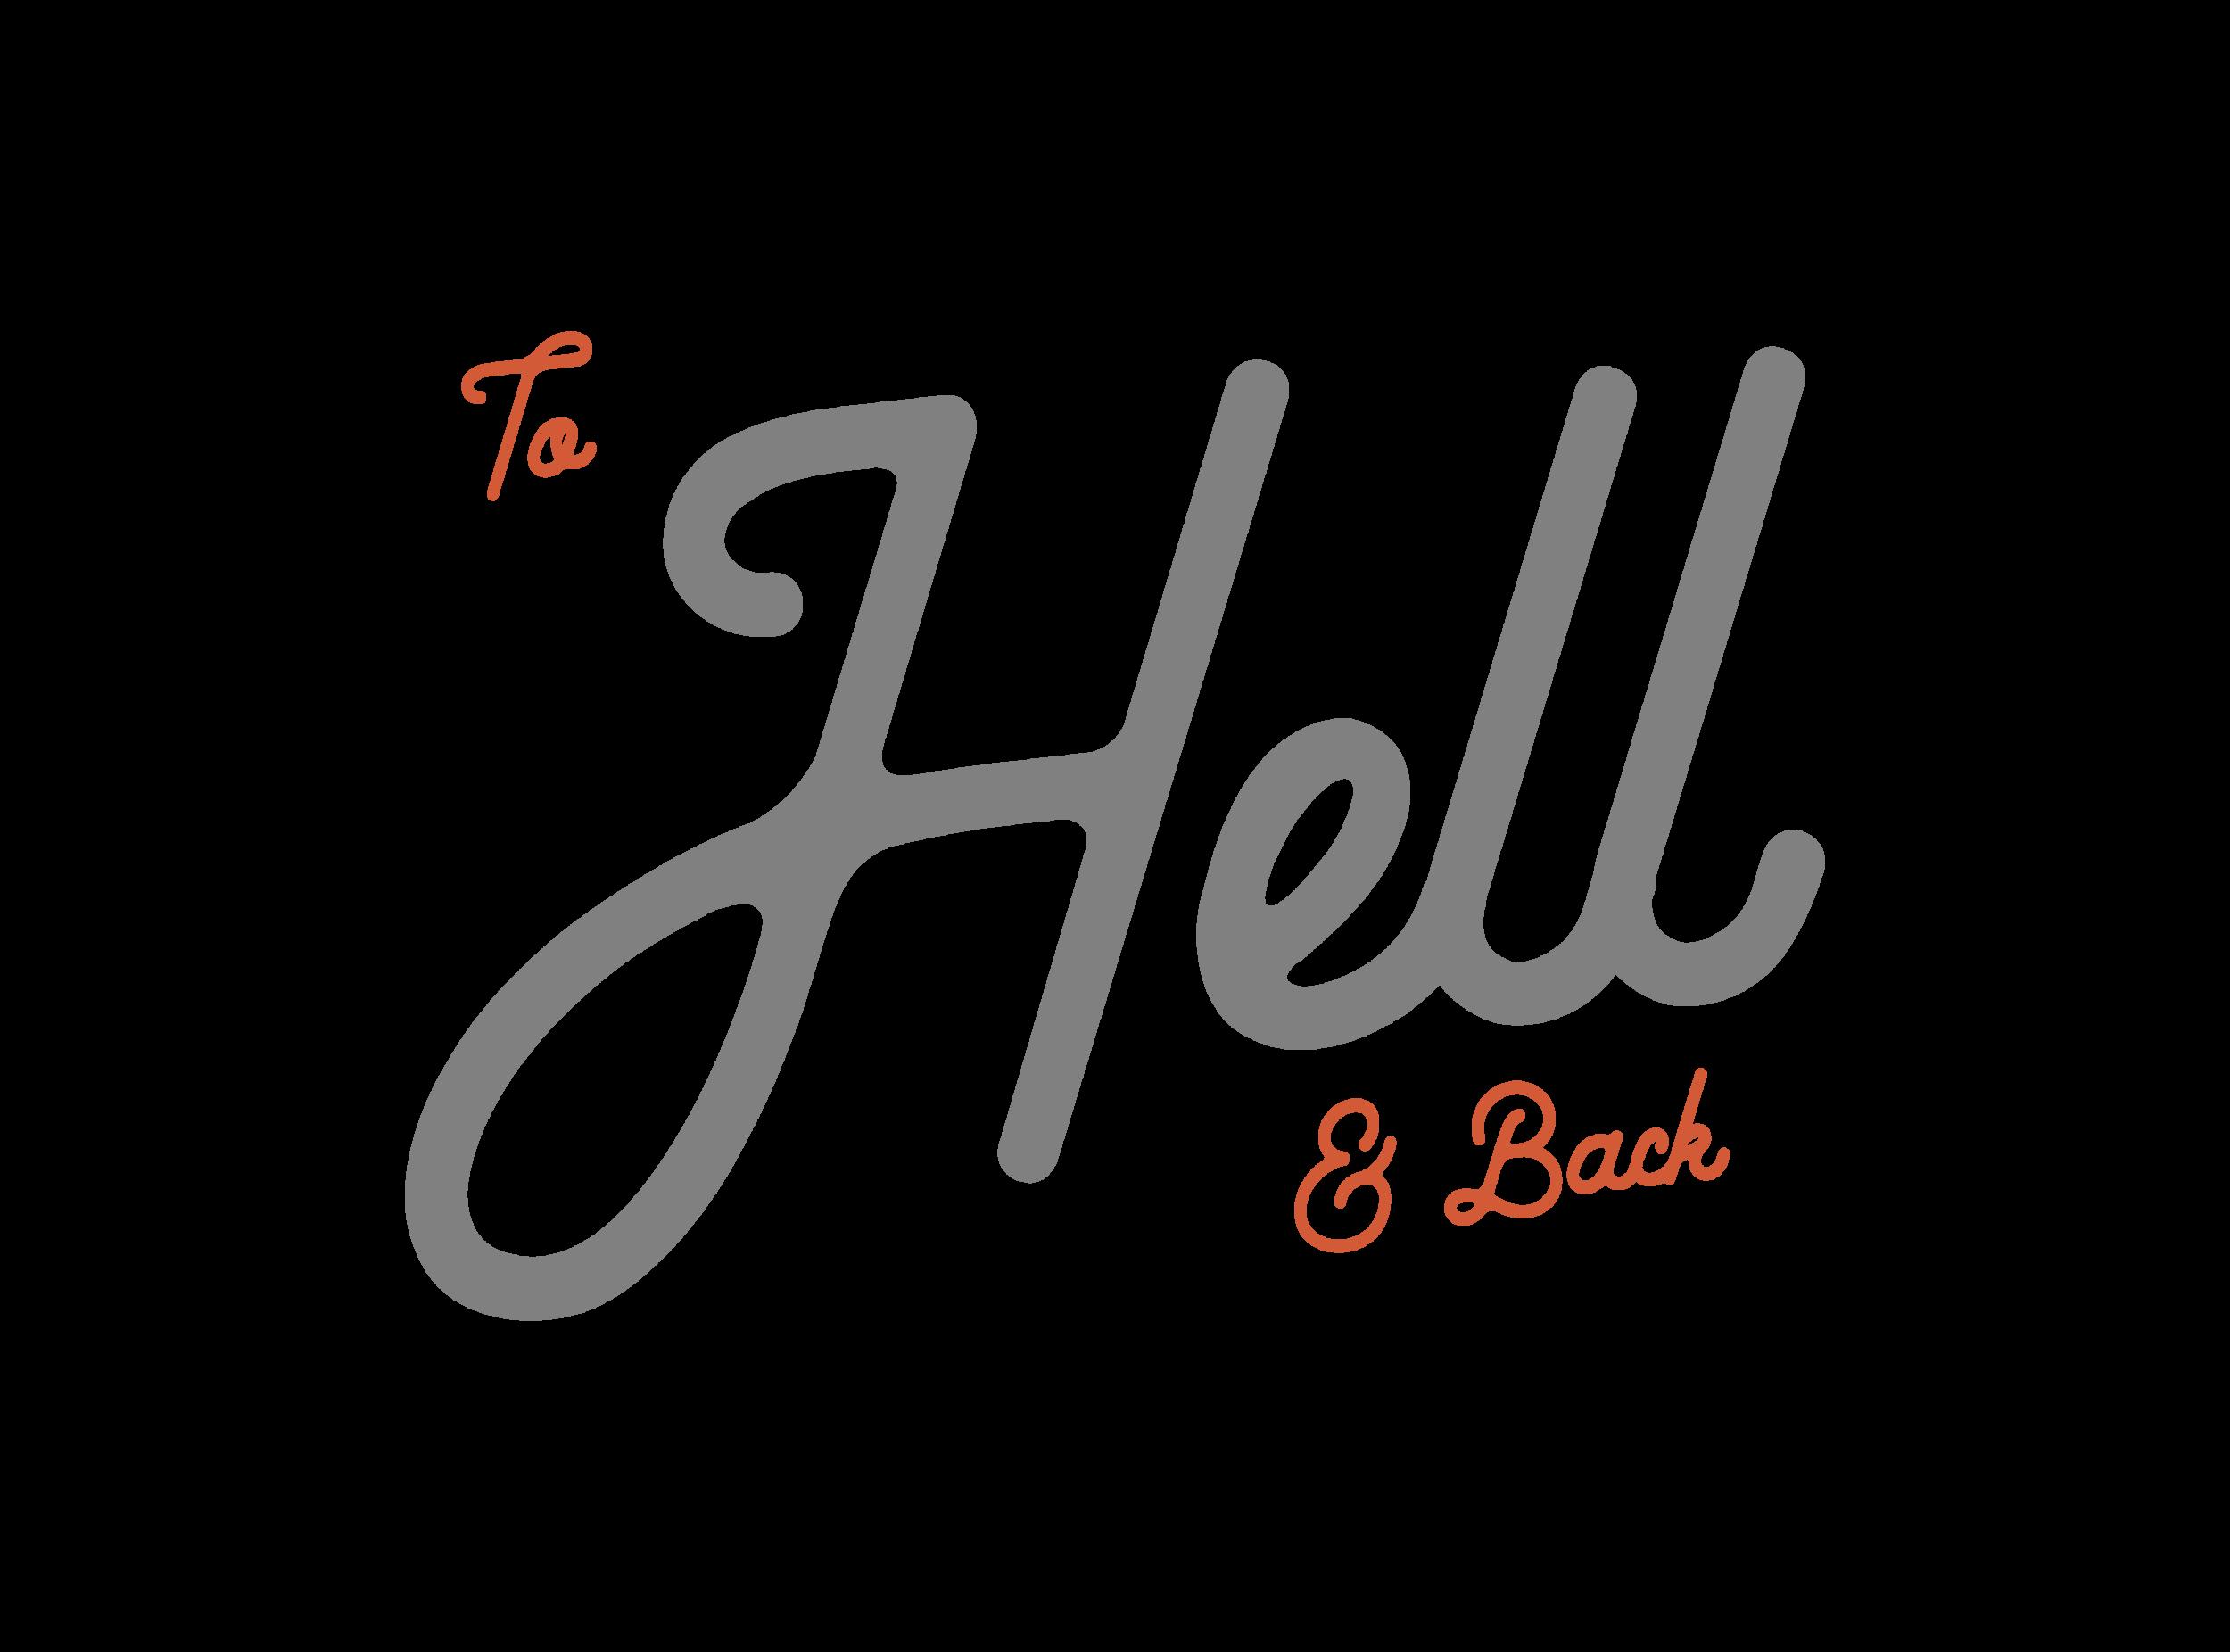 hellandback_logo-01.png